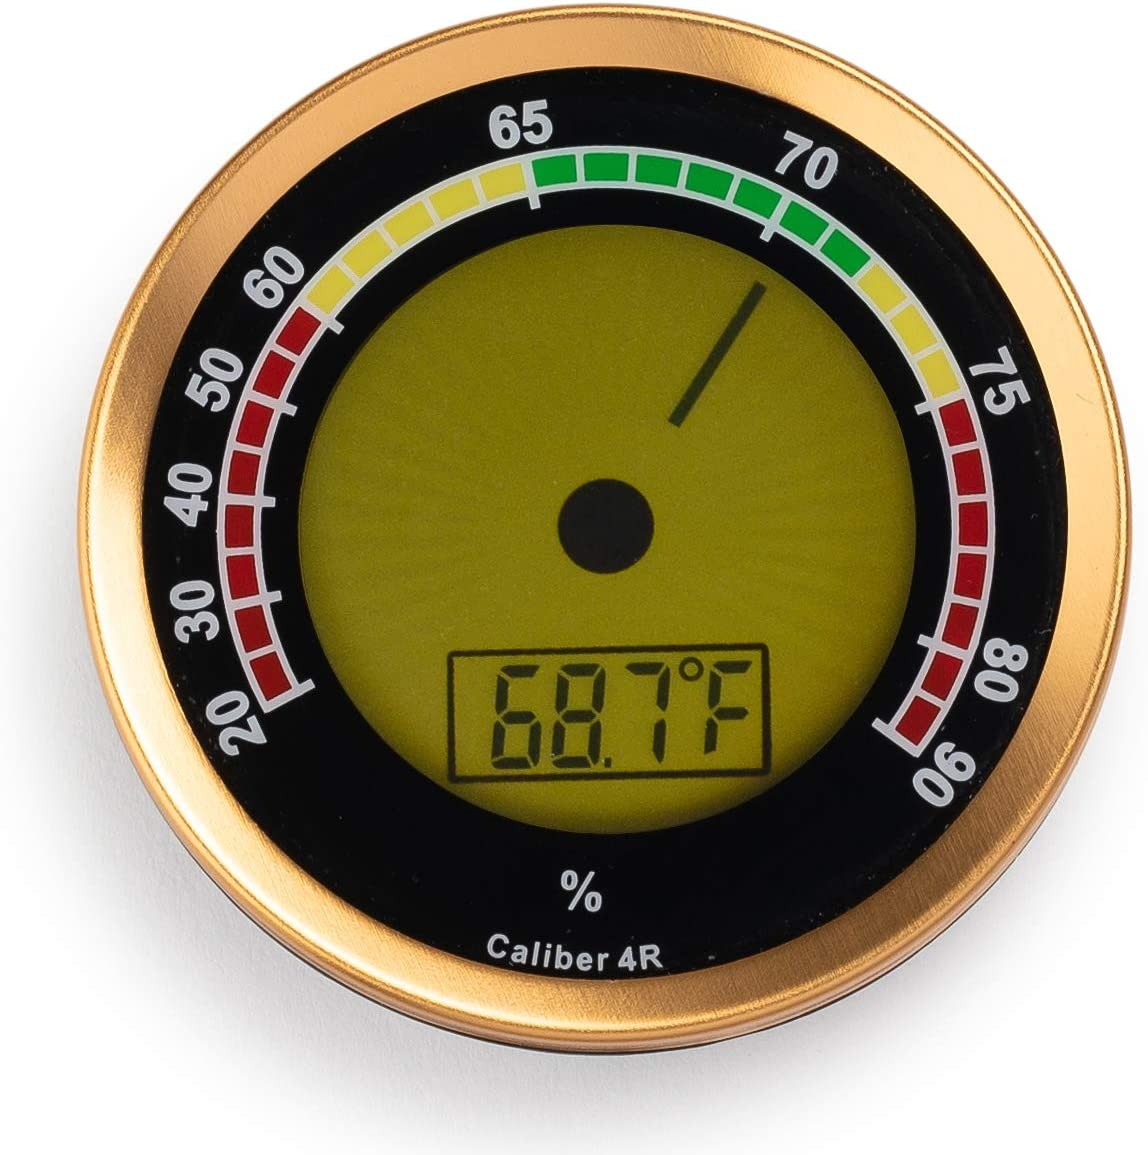 Caliber IV Digital Instrument Case Electronic Hygrometer Thermometer Western